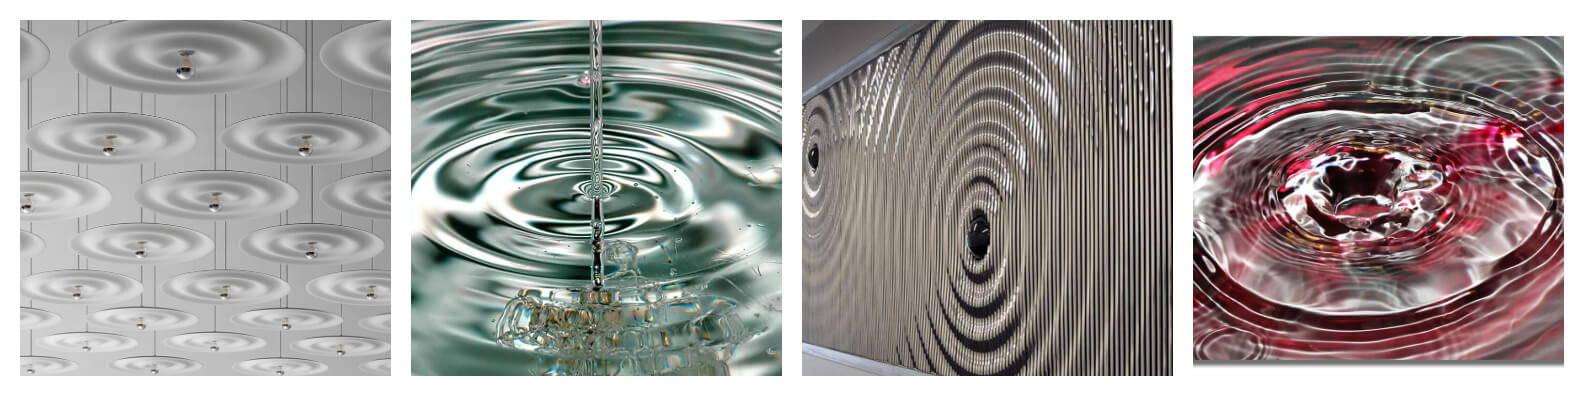 ripple inspiration images